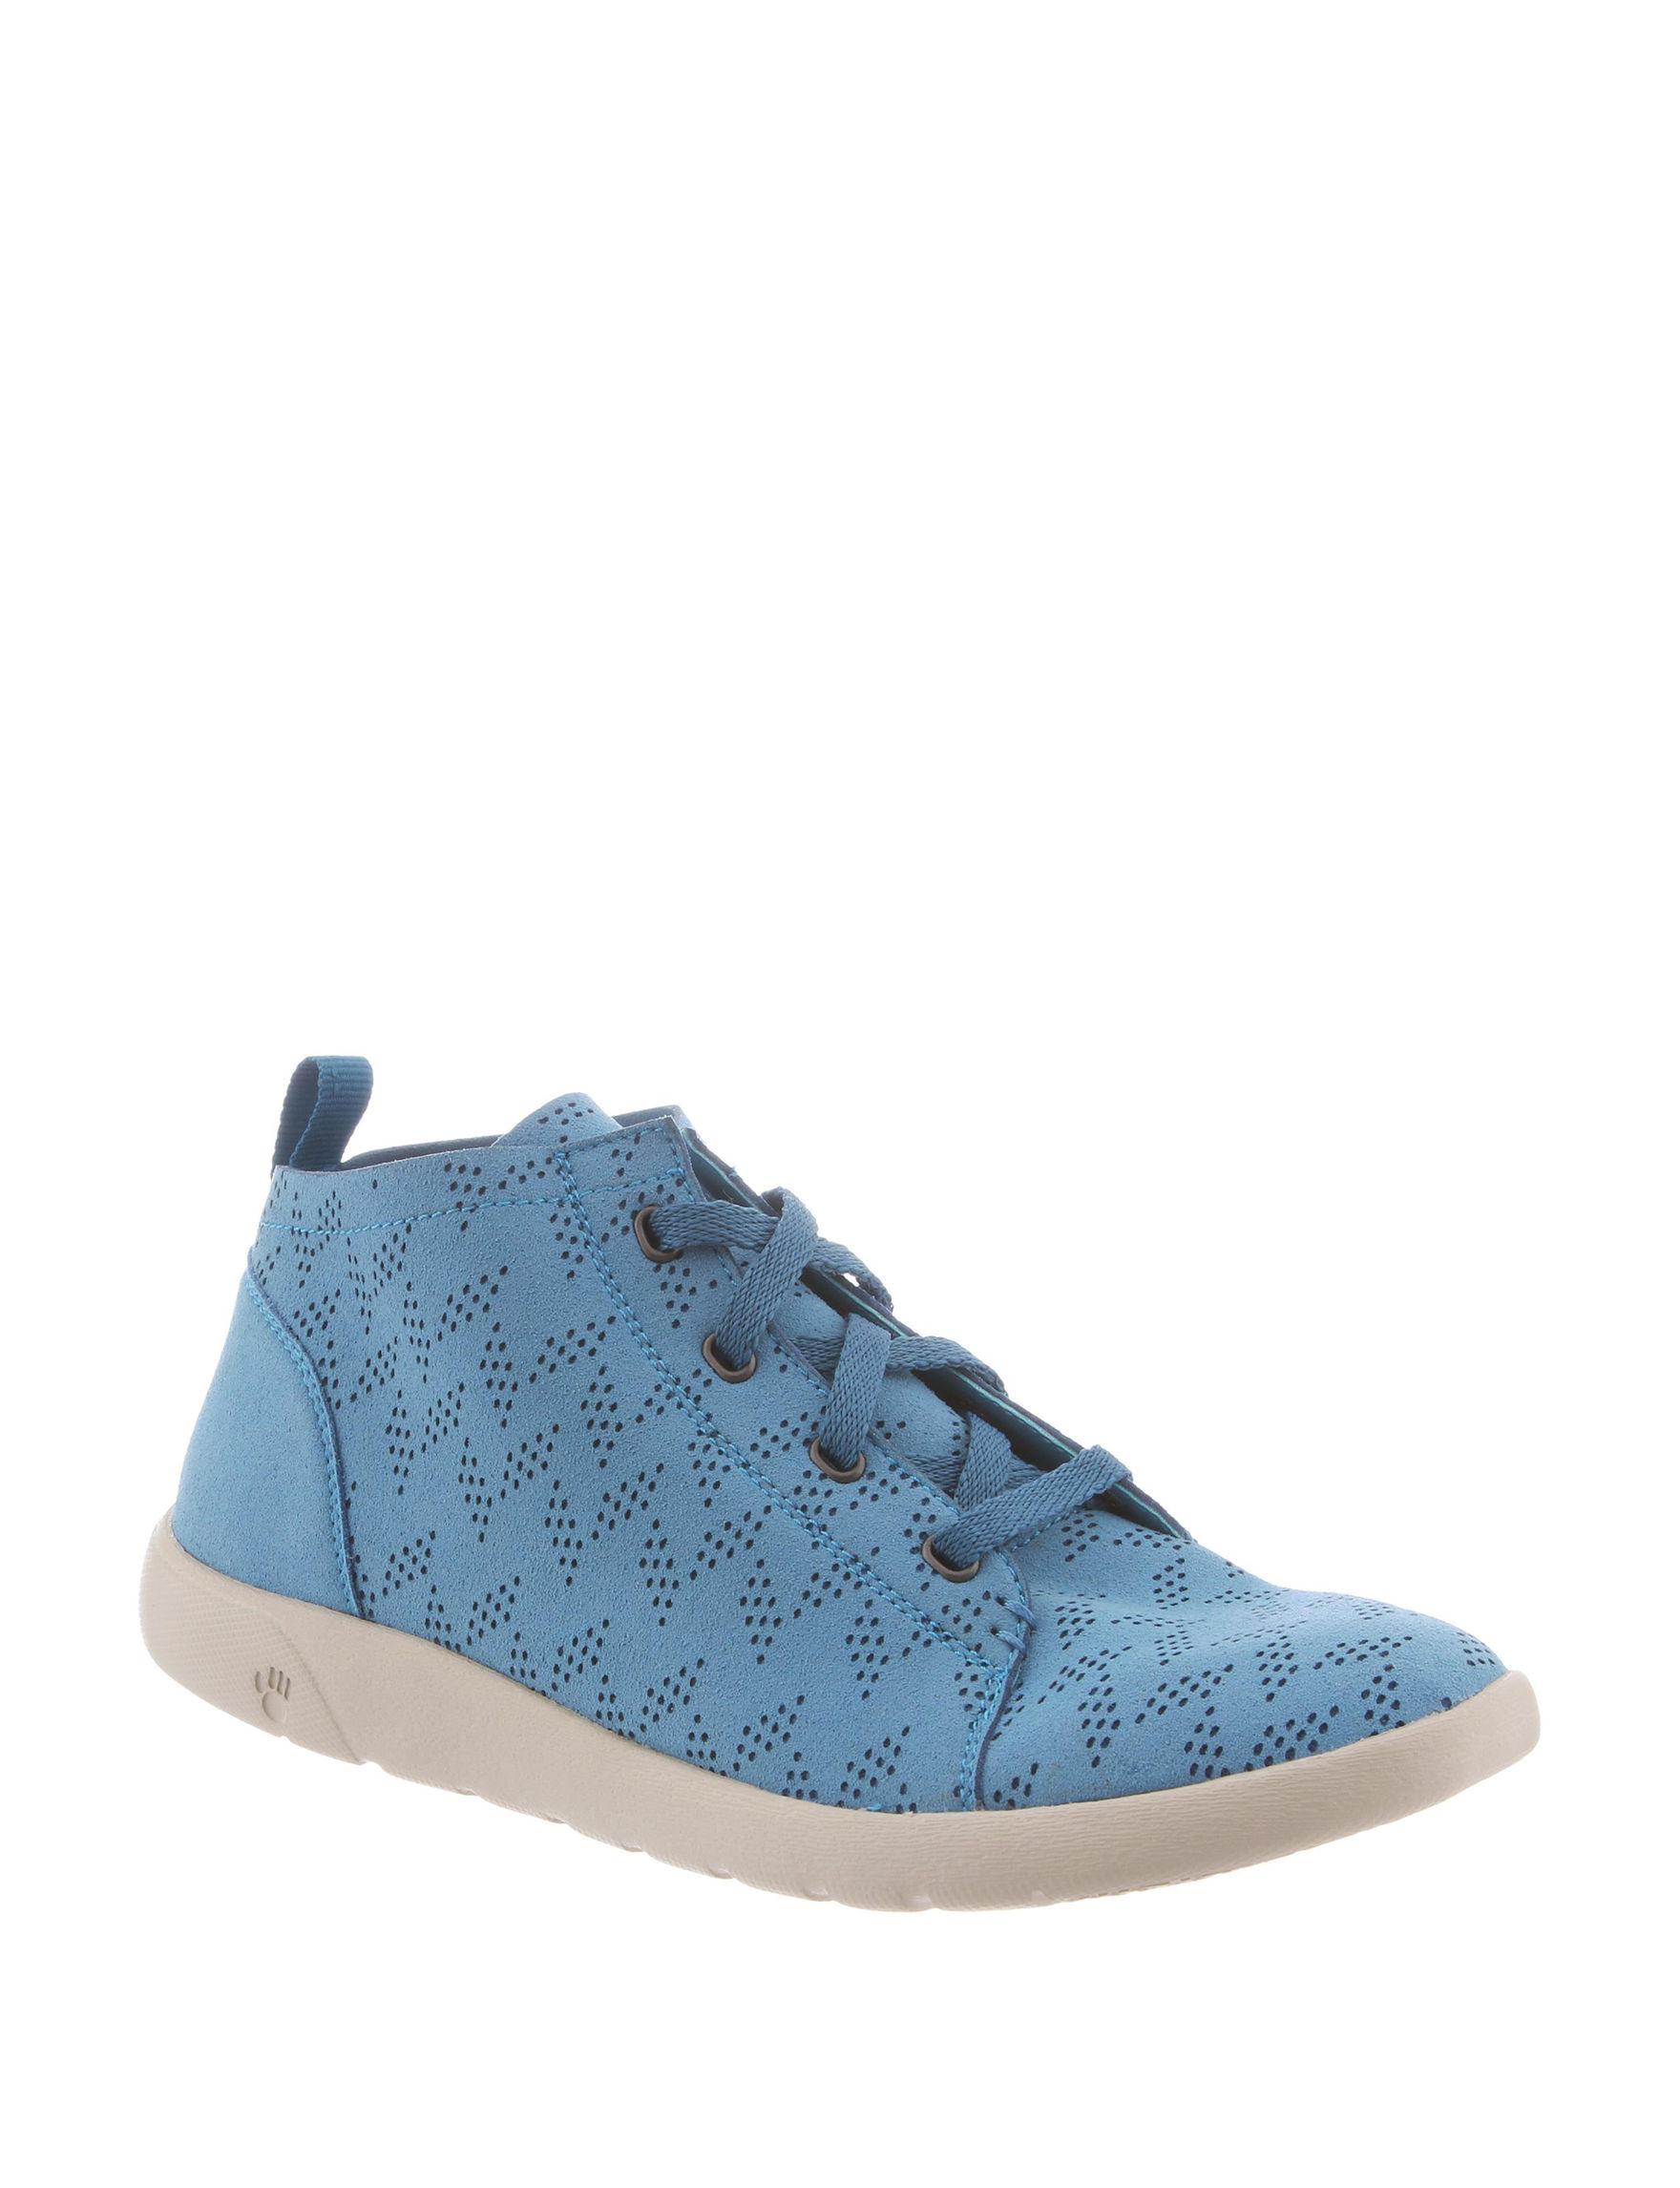 Bearpaw Blue Chukka Boots